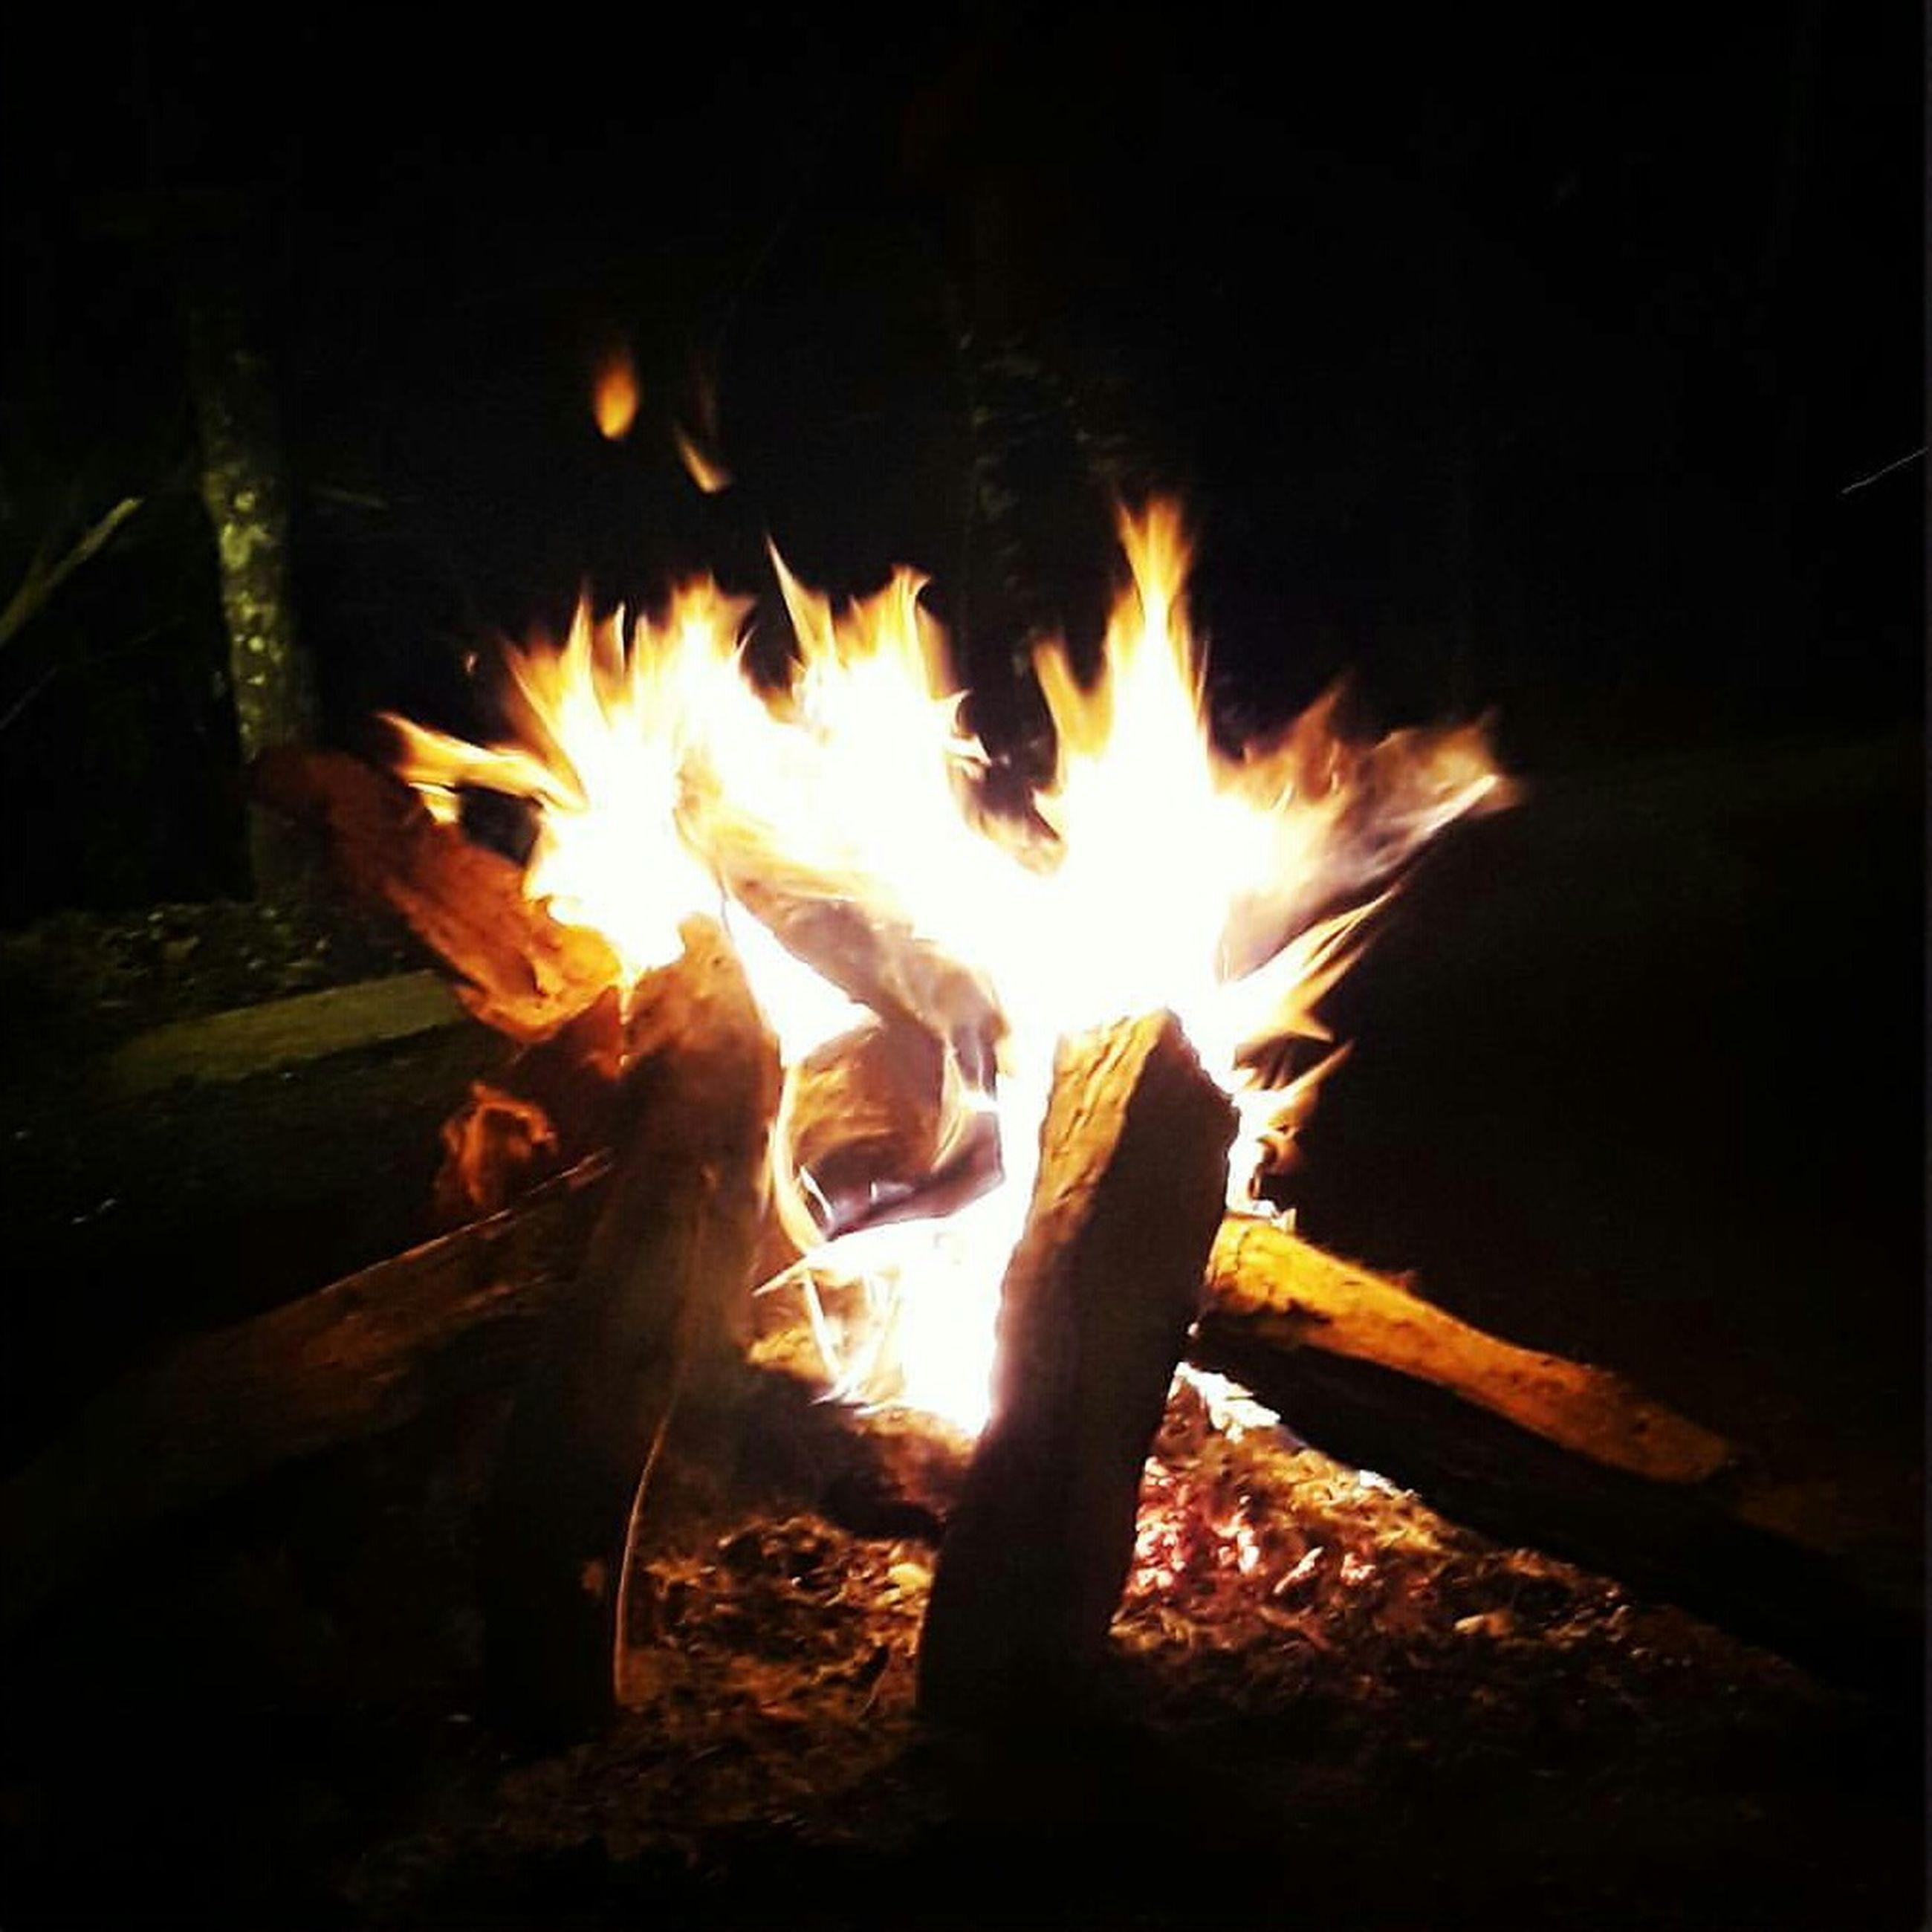 flame, fire - natural phenomenon, heat - temperature, burning, night, dark, outdoors, illuminated, bonfire, no people, close-up, fire pit